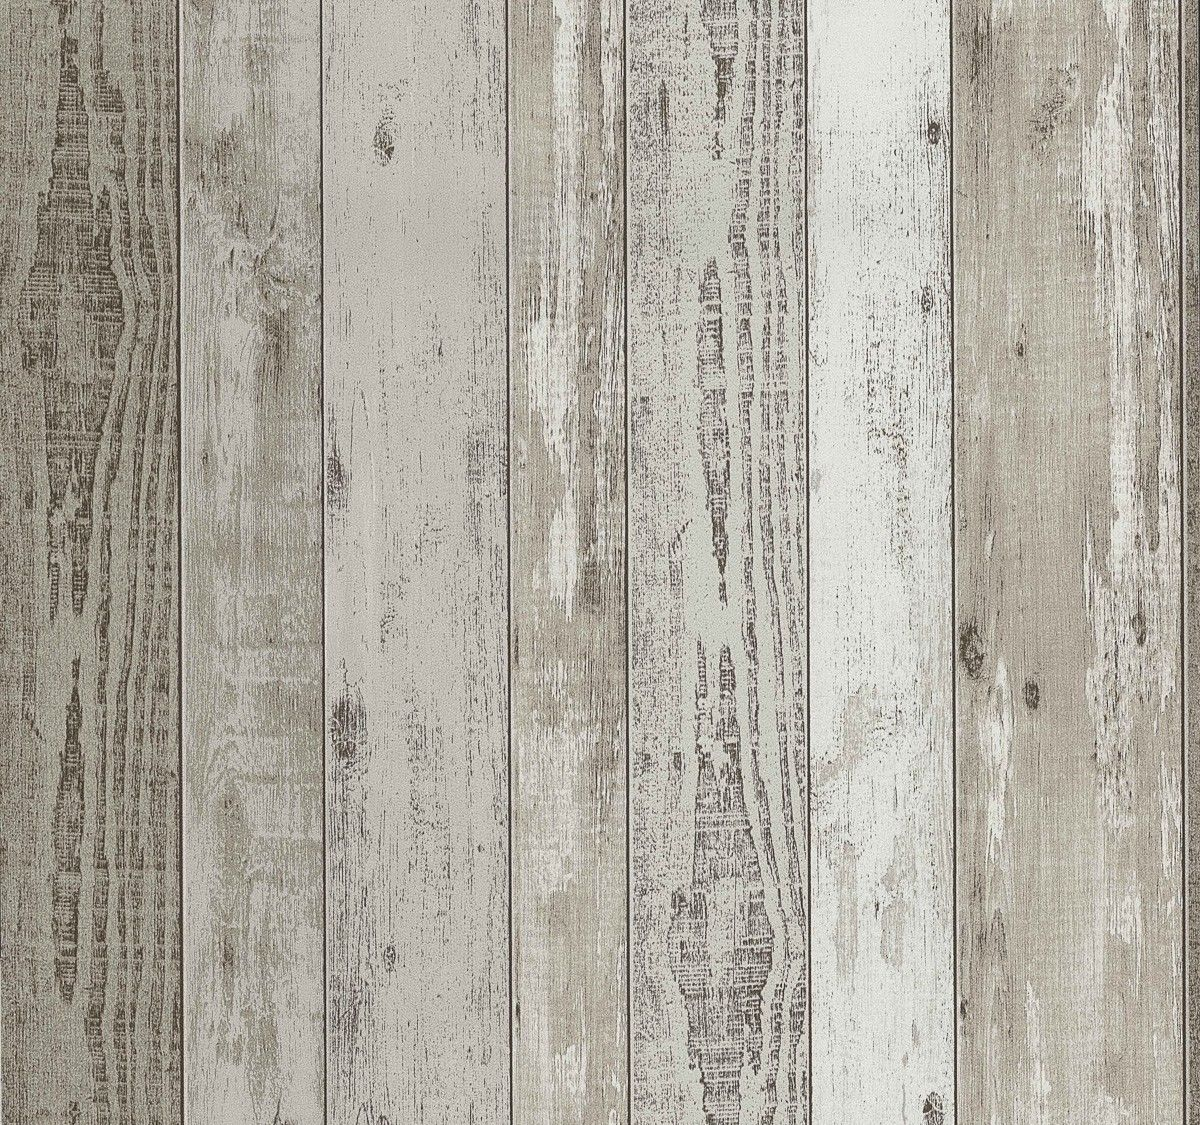 wood effect wallpaper distressed grain wooden realistic. Black Bedroom Furniture Sets. Home Design Ideas